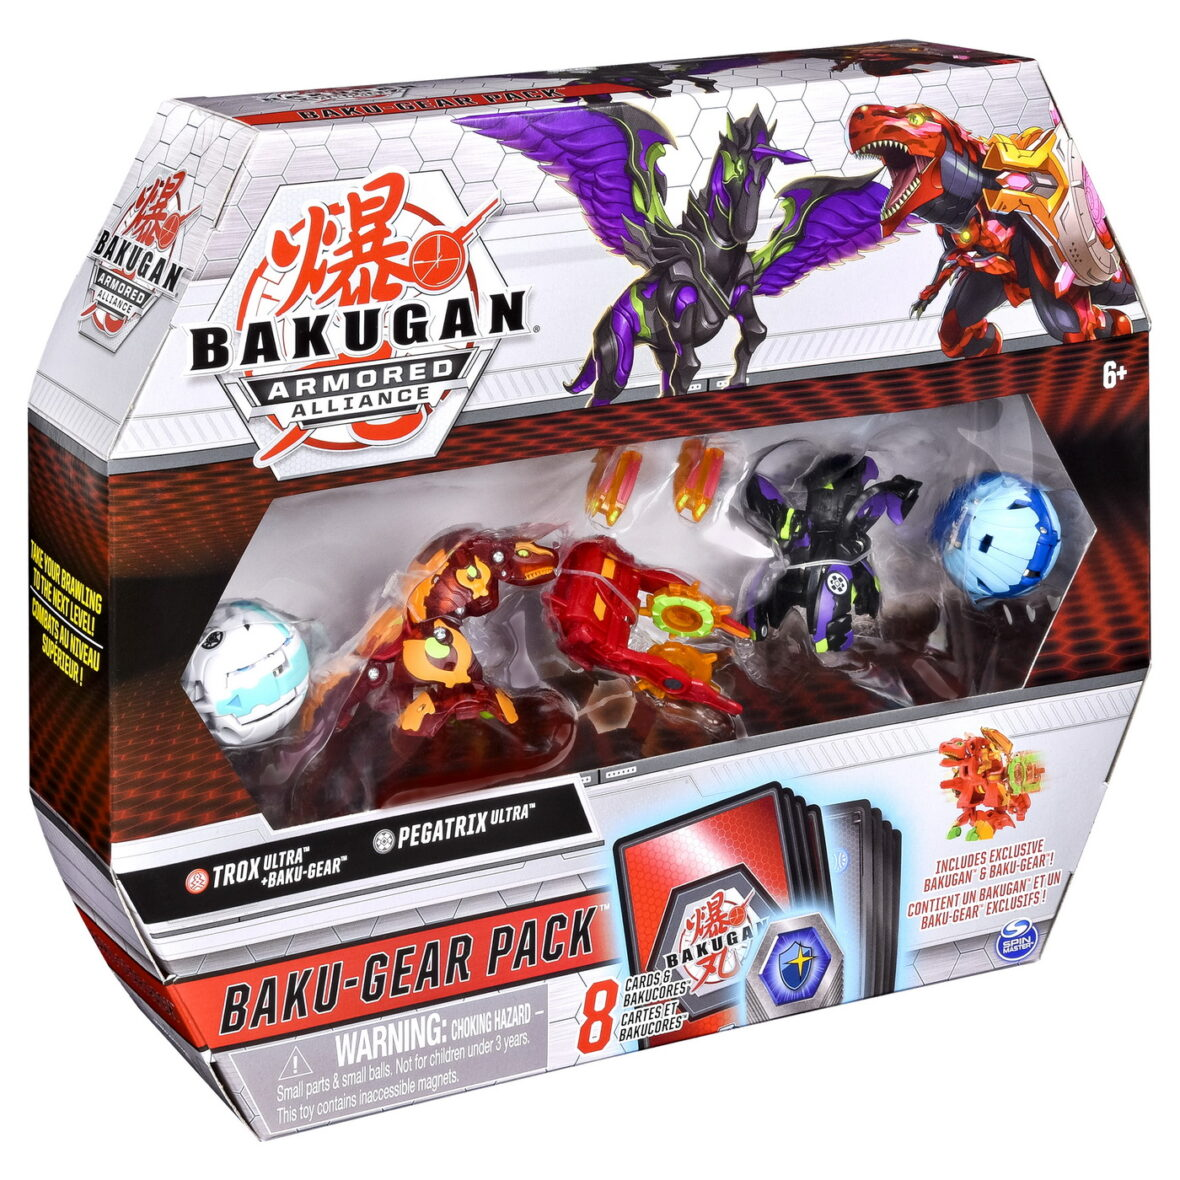 Bakugan S2 Set De Lupta Ultra Trox Pegatrix Cu Baku-gear